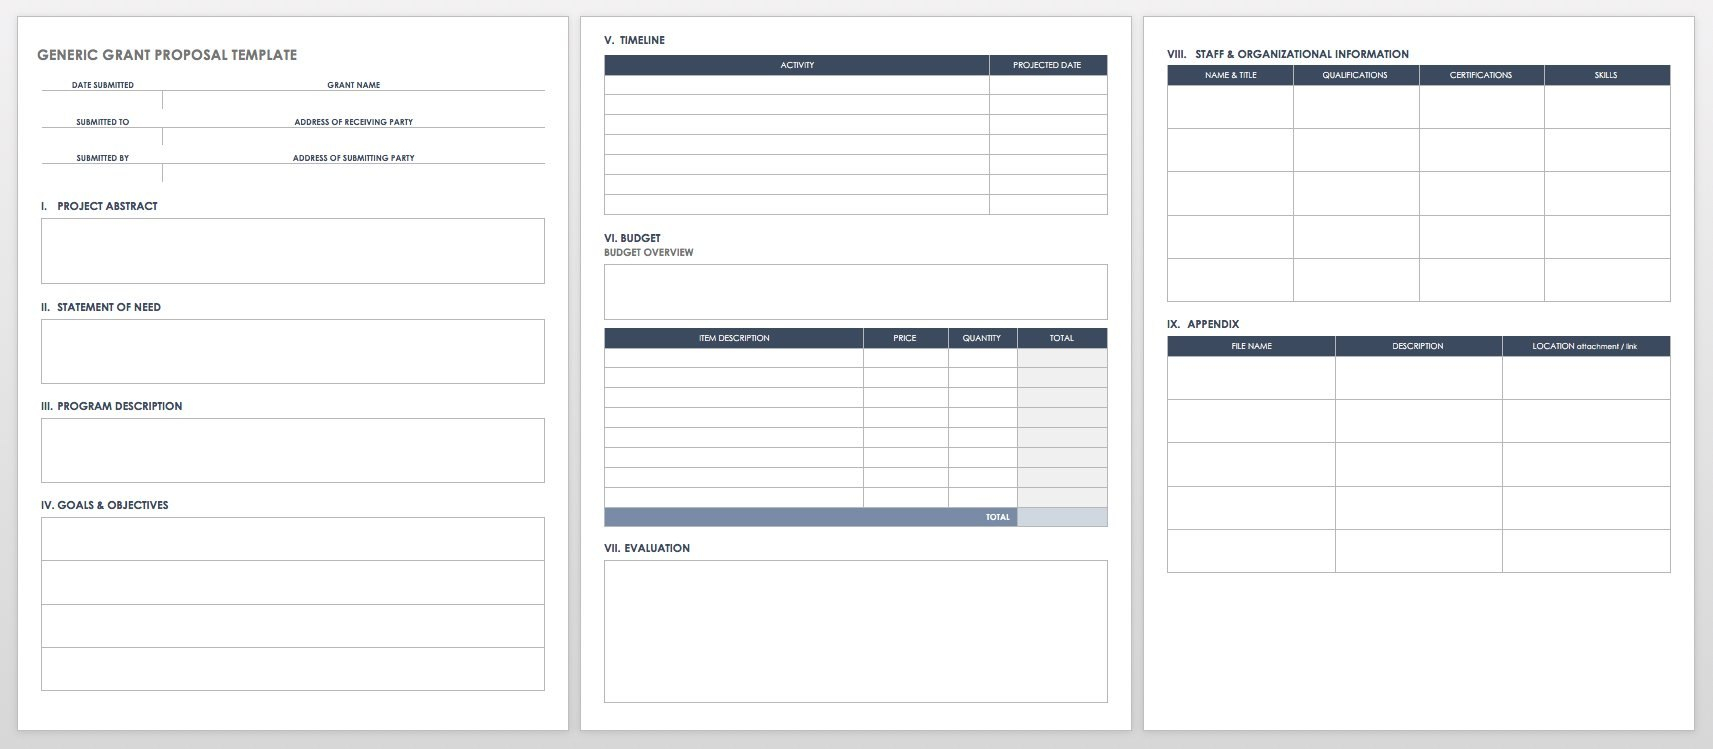 Free Grant Proposal Templates  Smartsheet Within Grant Proposal Template Word